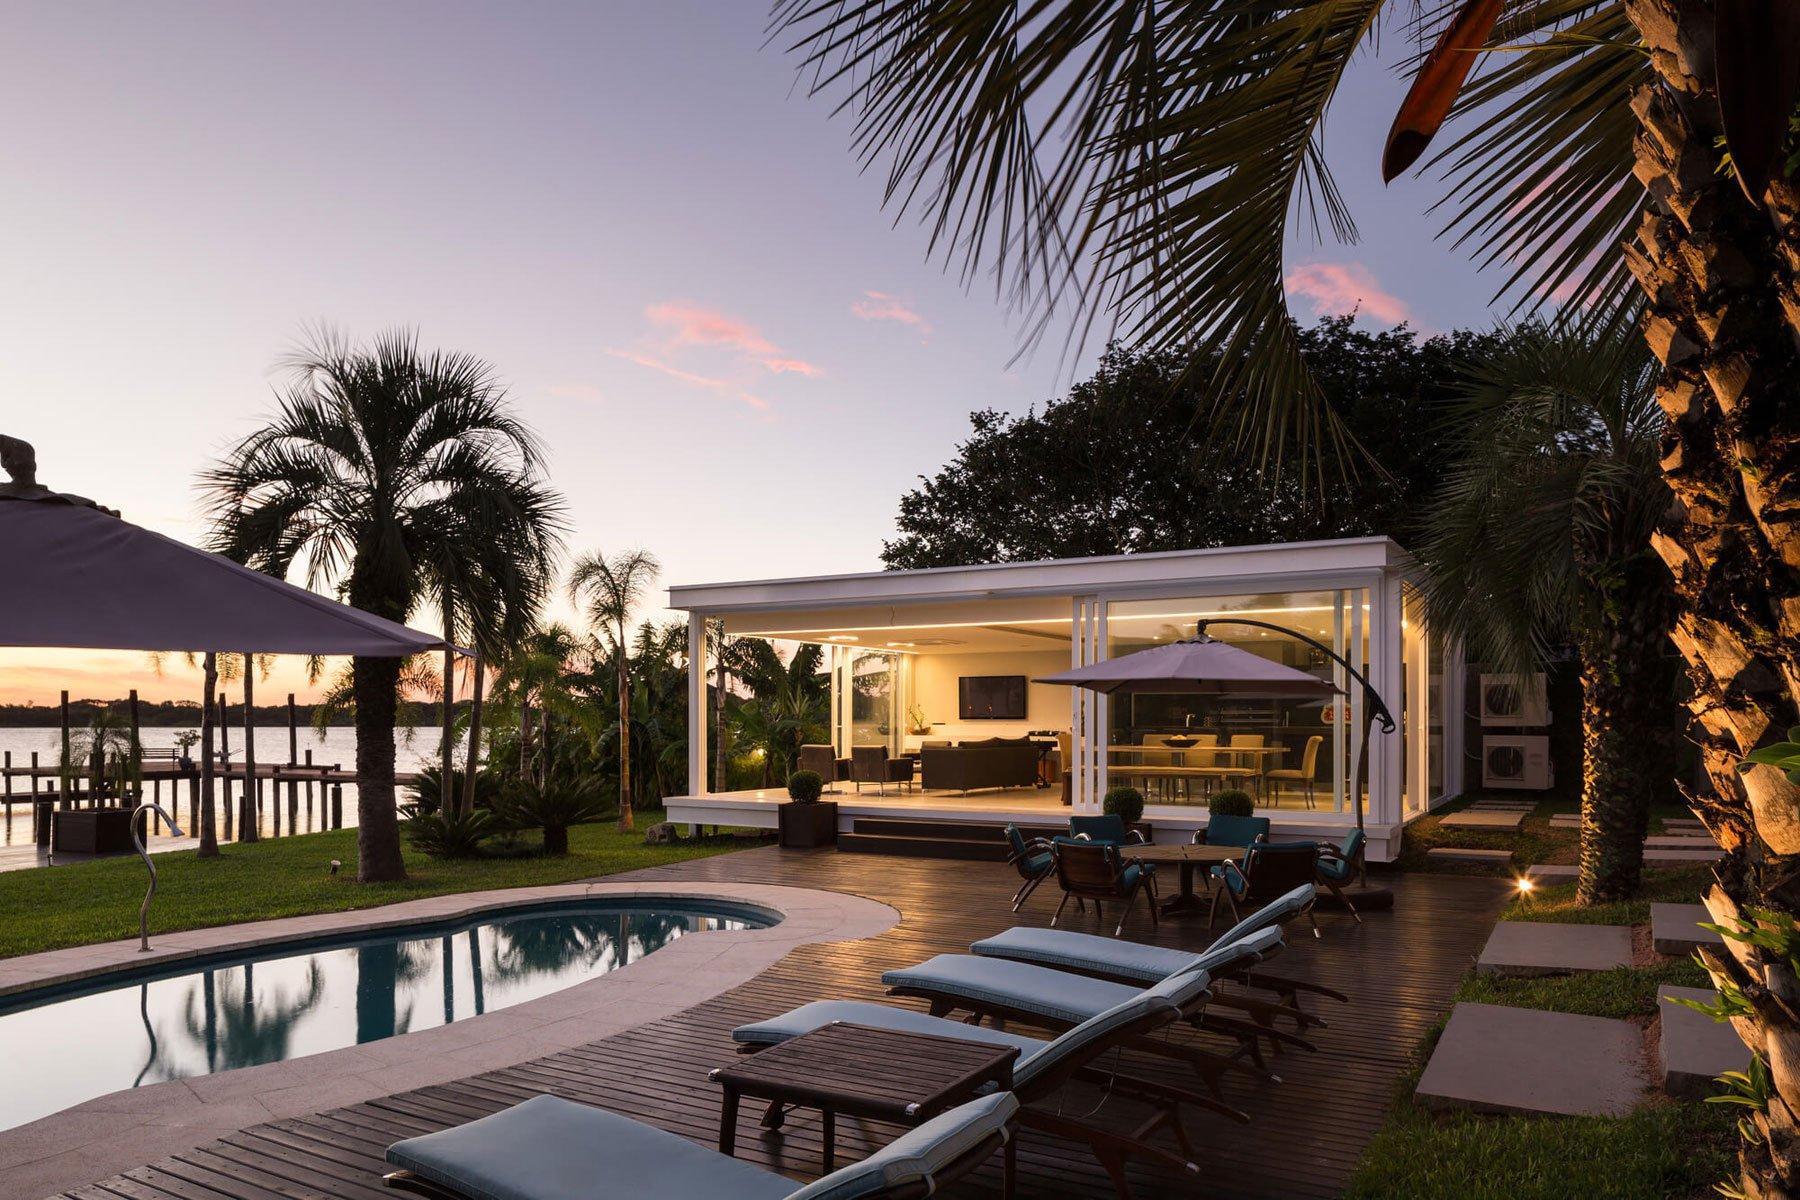 Pool-House-in-Porto-Alegre-24